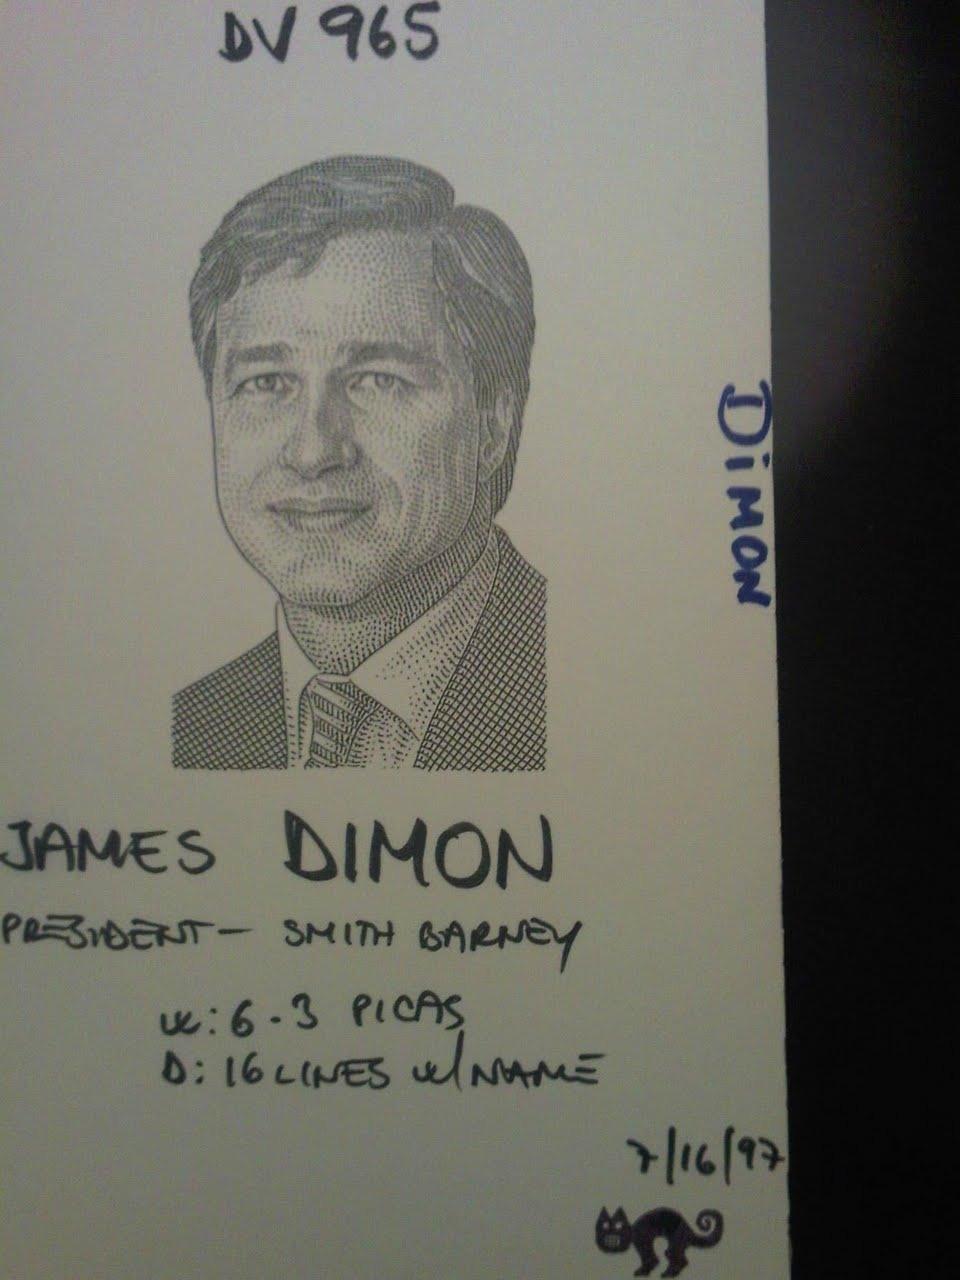 Jamie Dimon